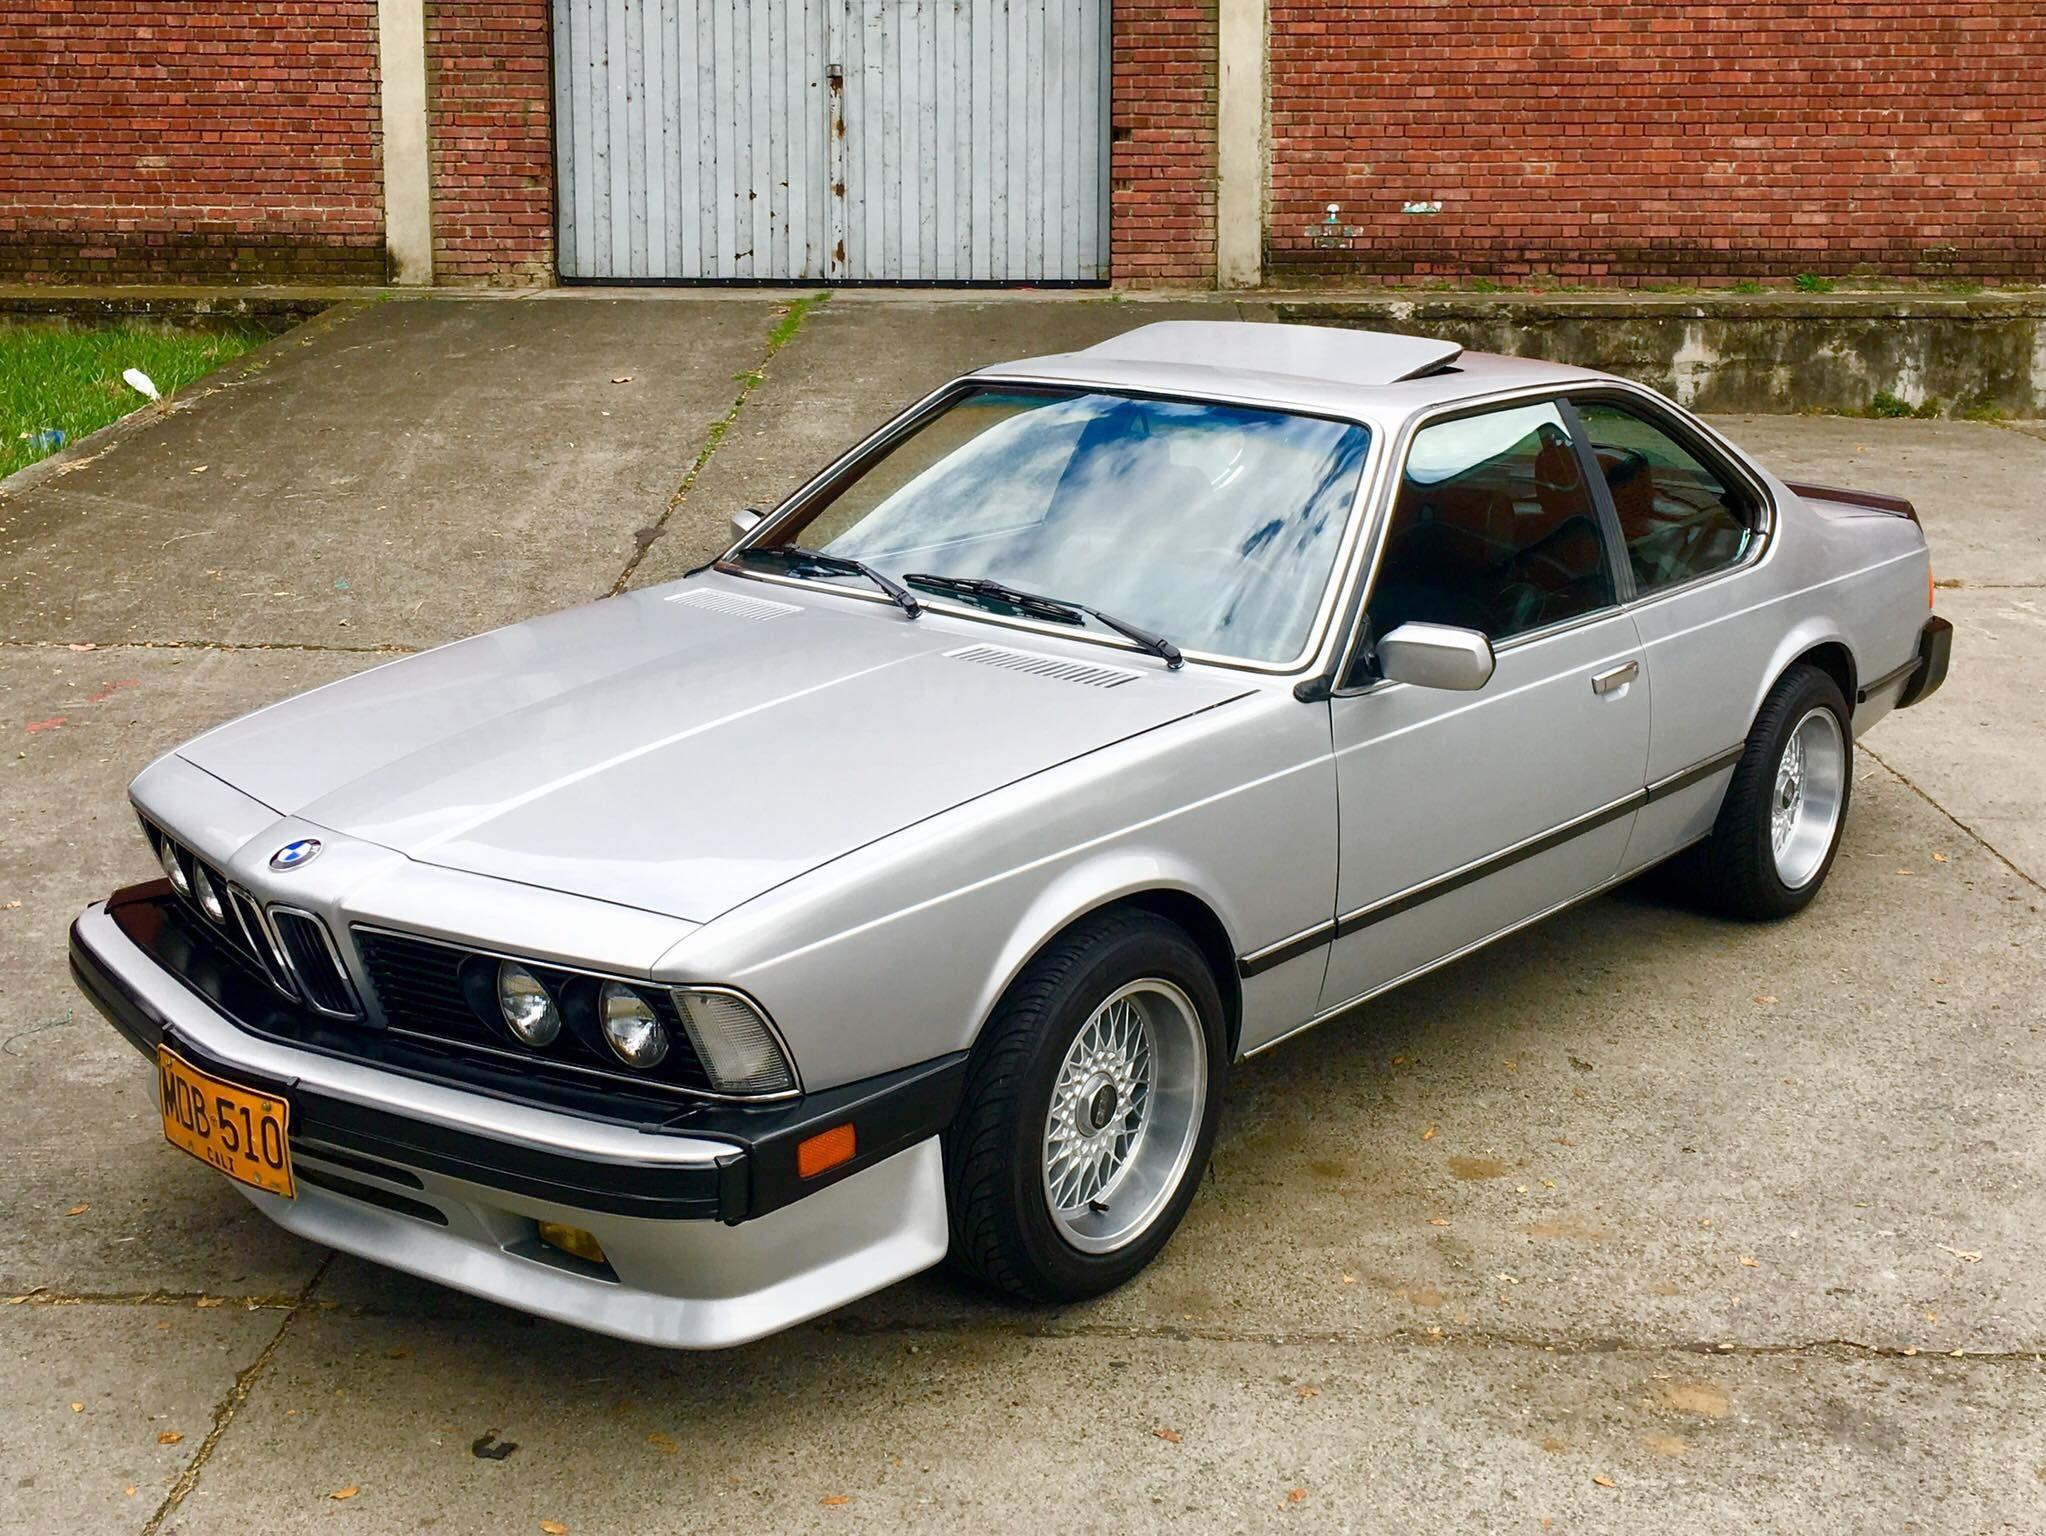 Pin van K. AZ op BMW 6 Series E24 | Oldtimers, Motor